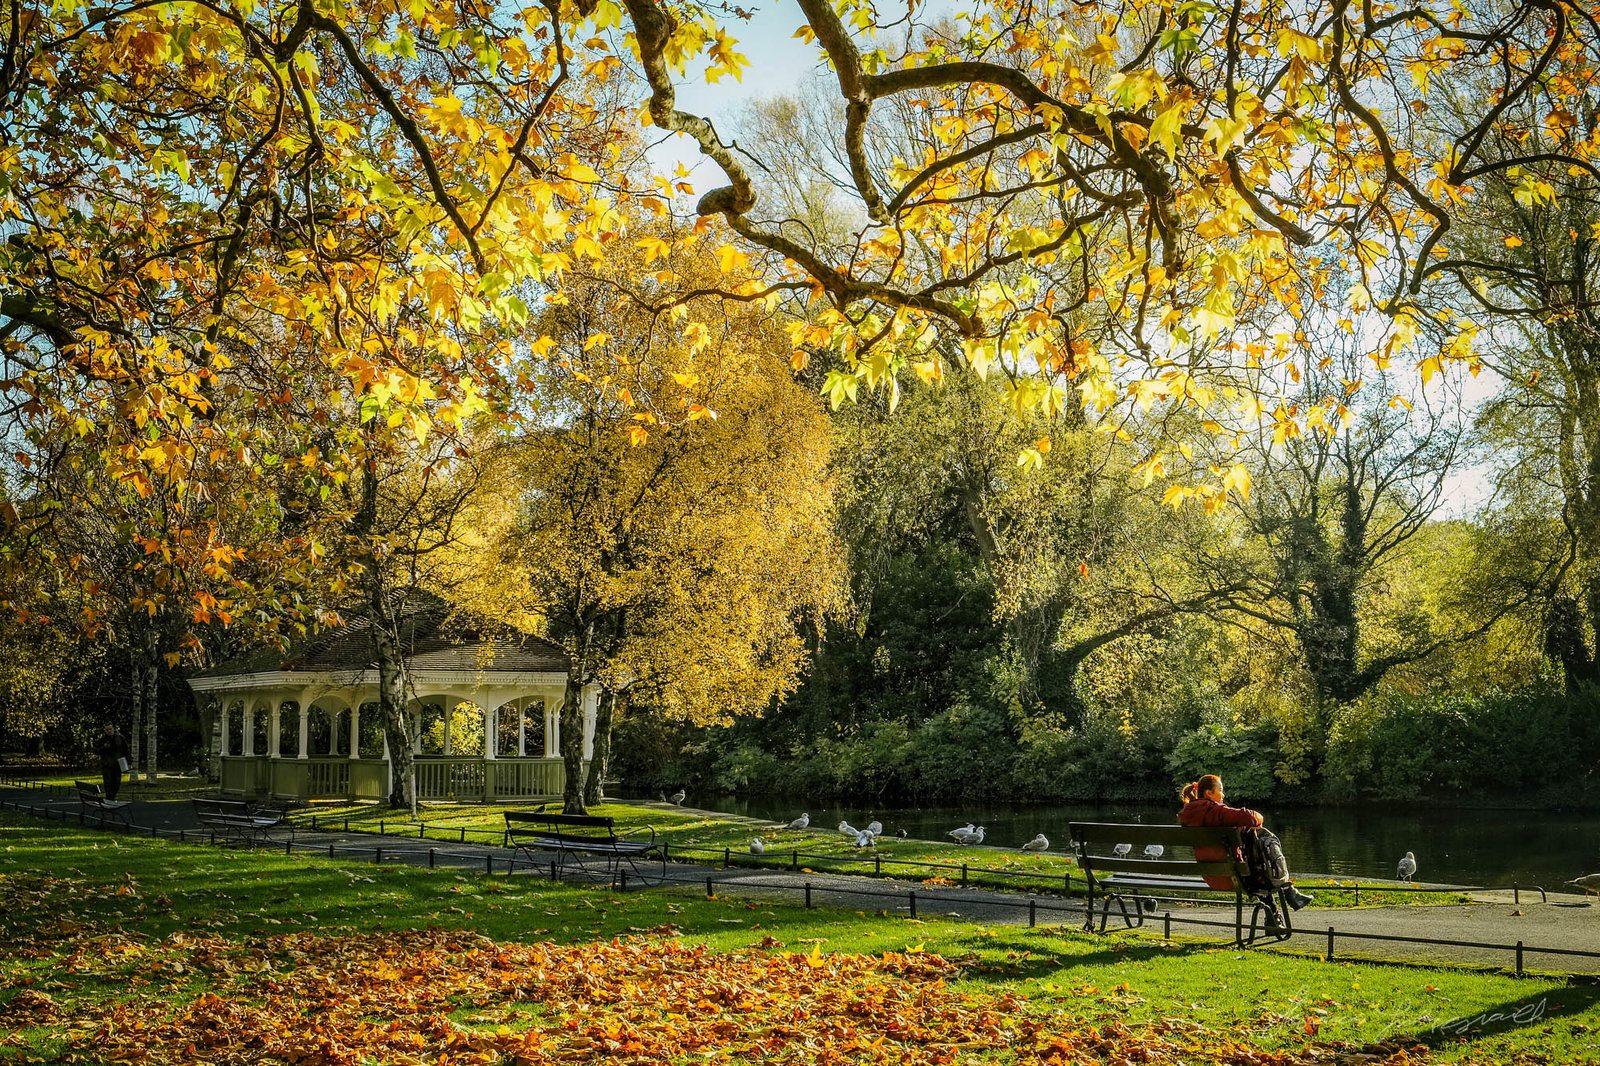 St. Stephen's Green in Autumn